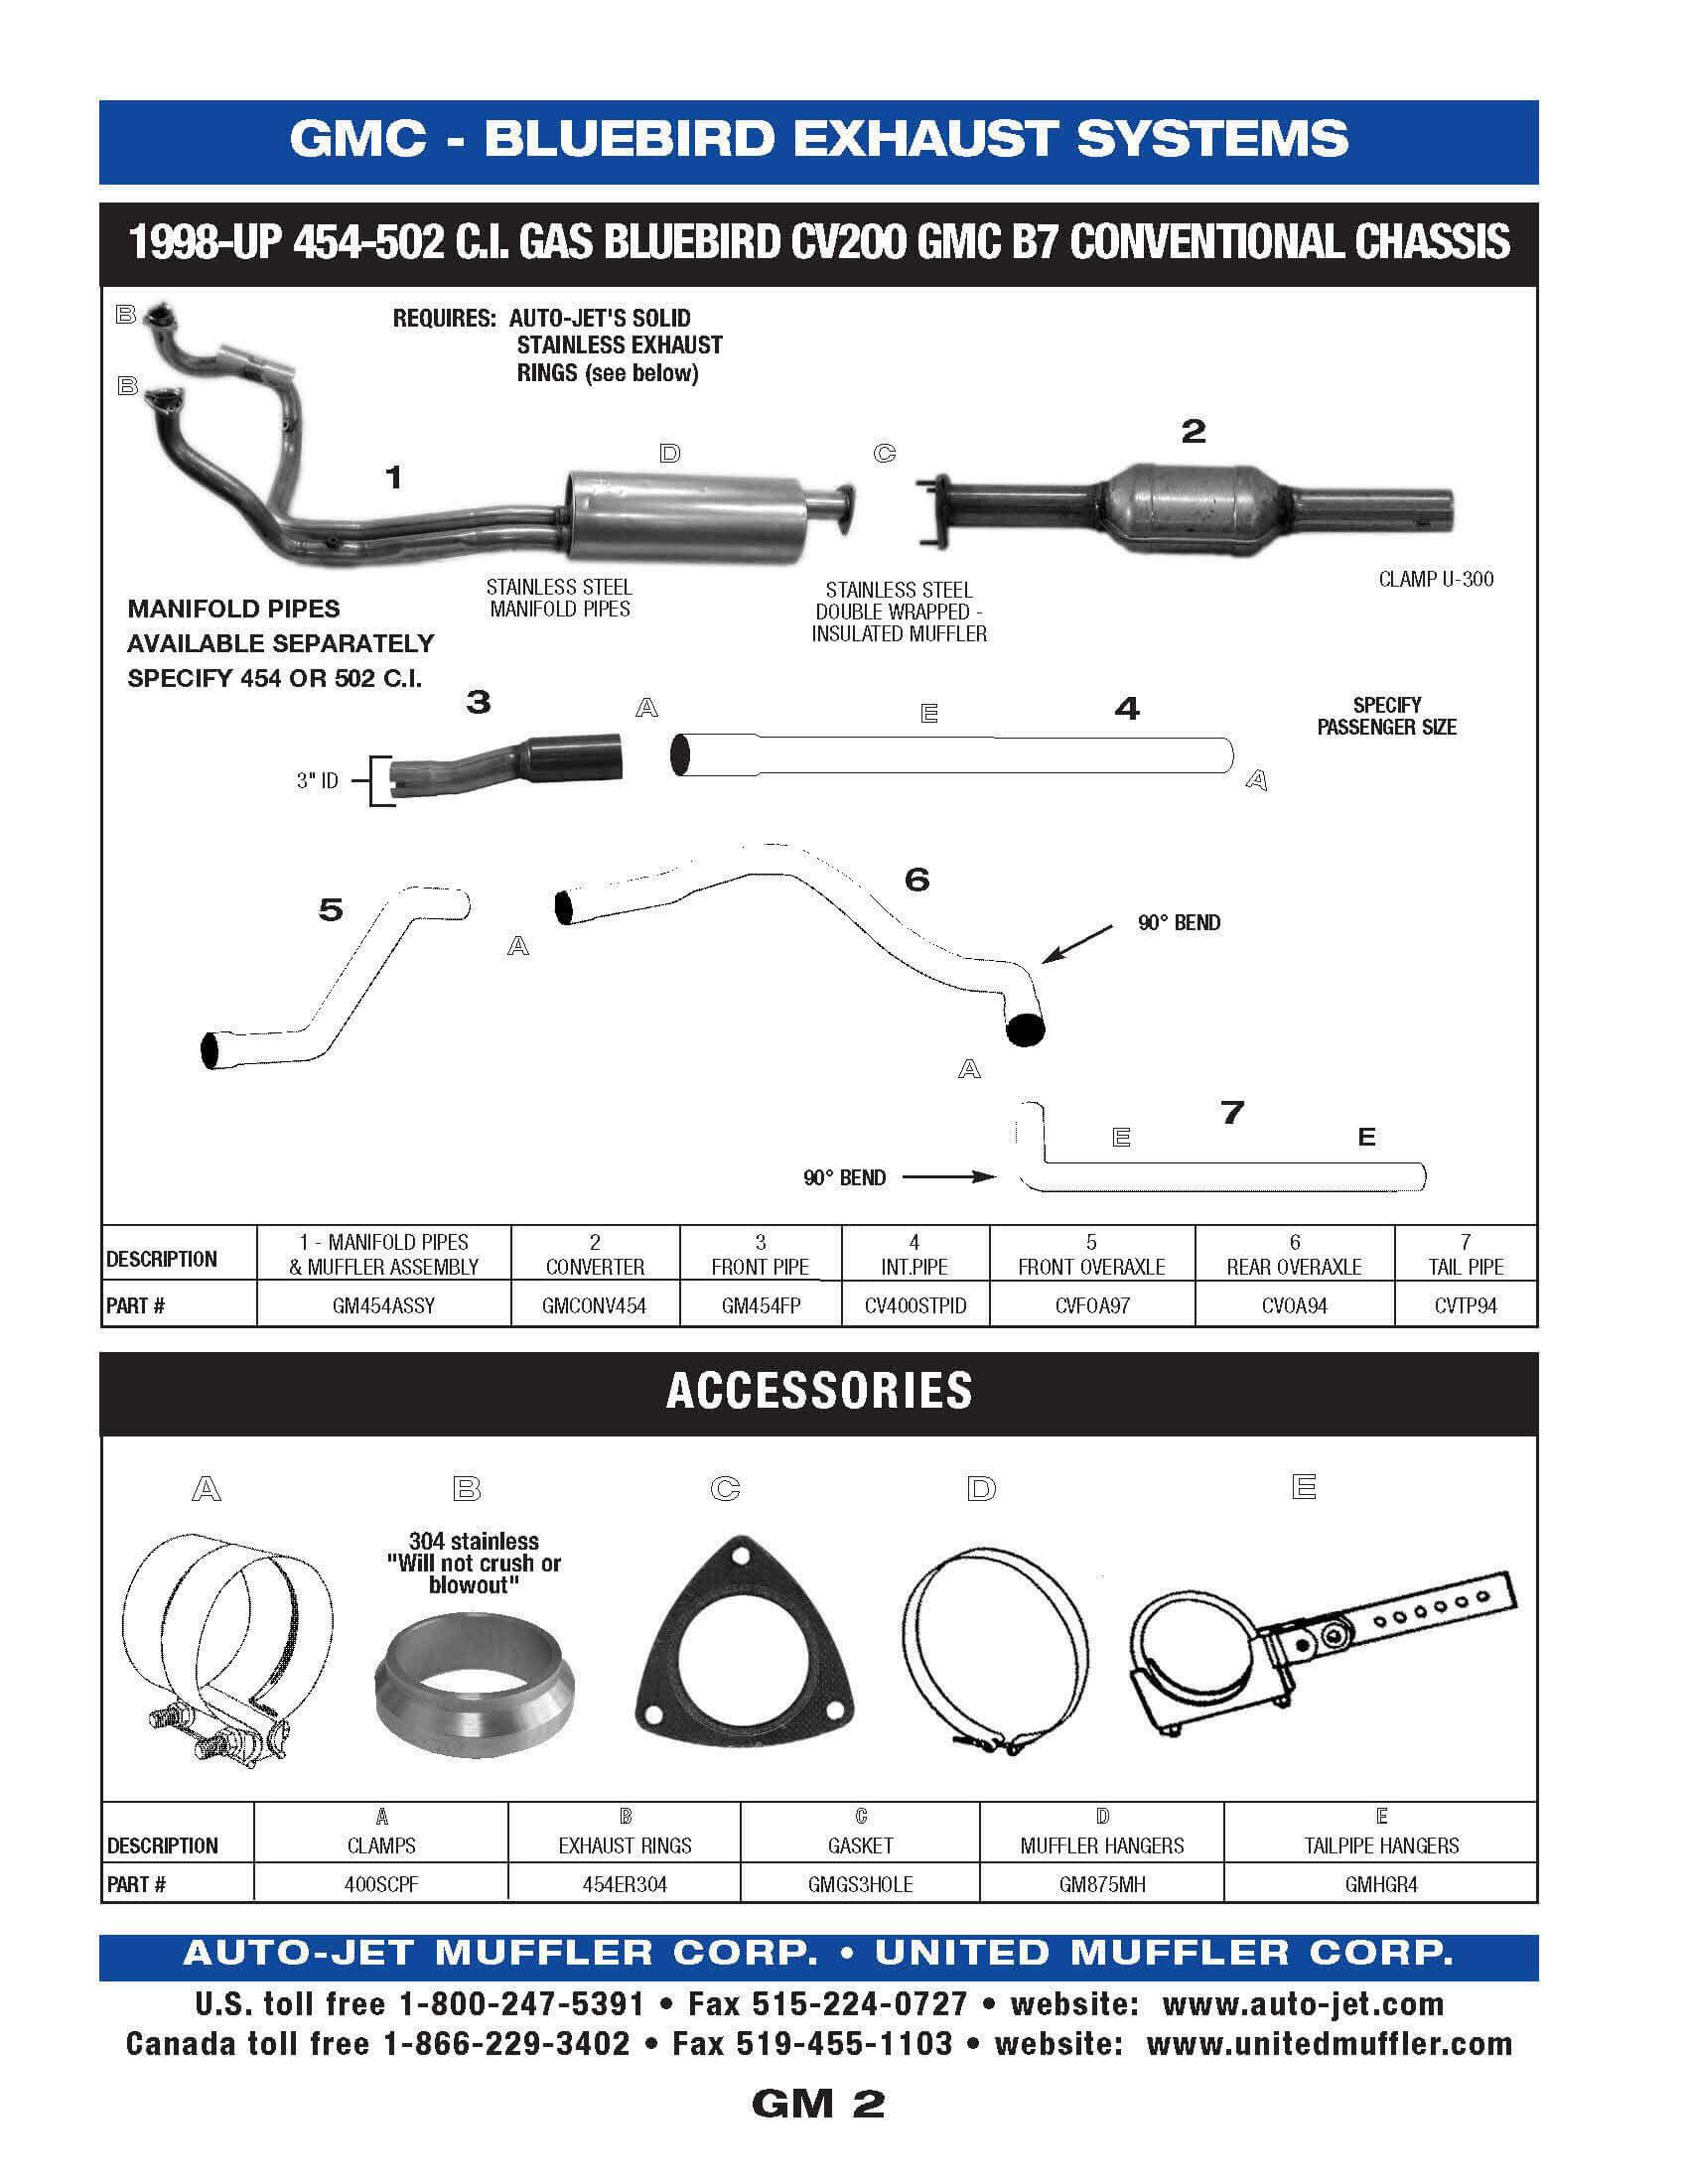 Gmc United Muffler Corporation 3 1 Liter Gm Engine Diagram 2